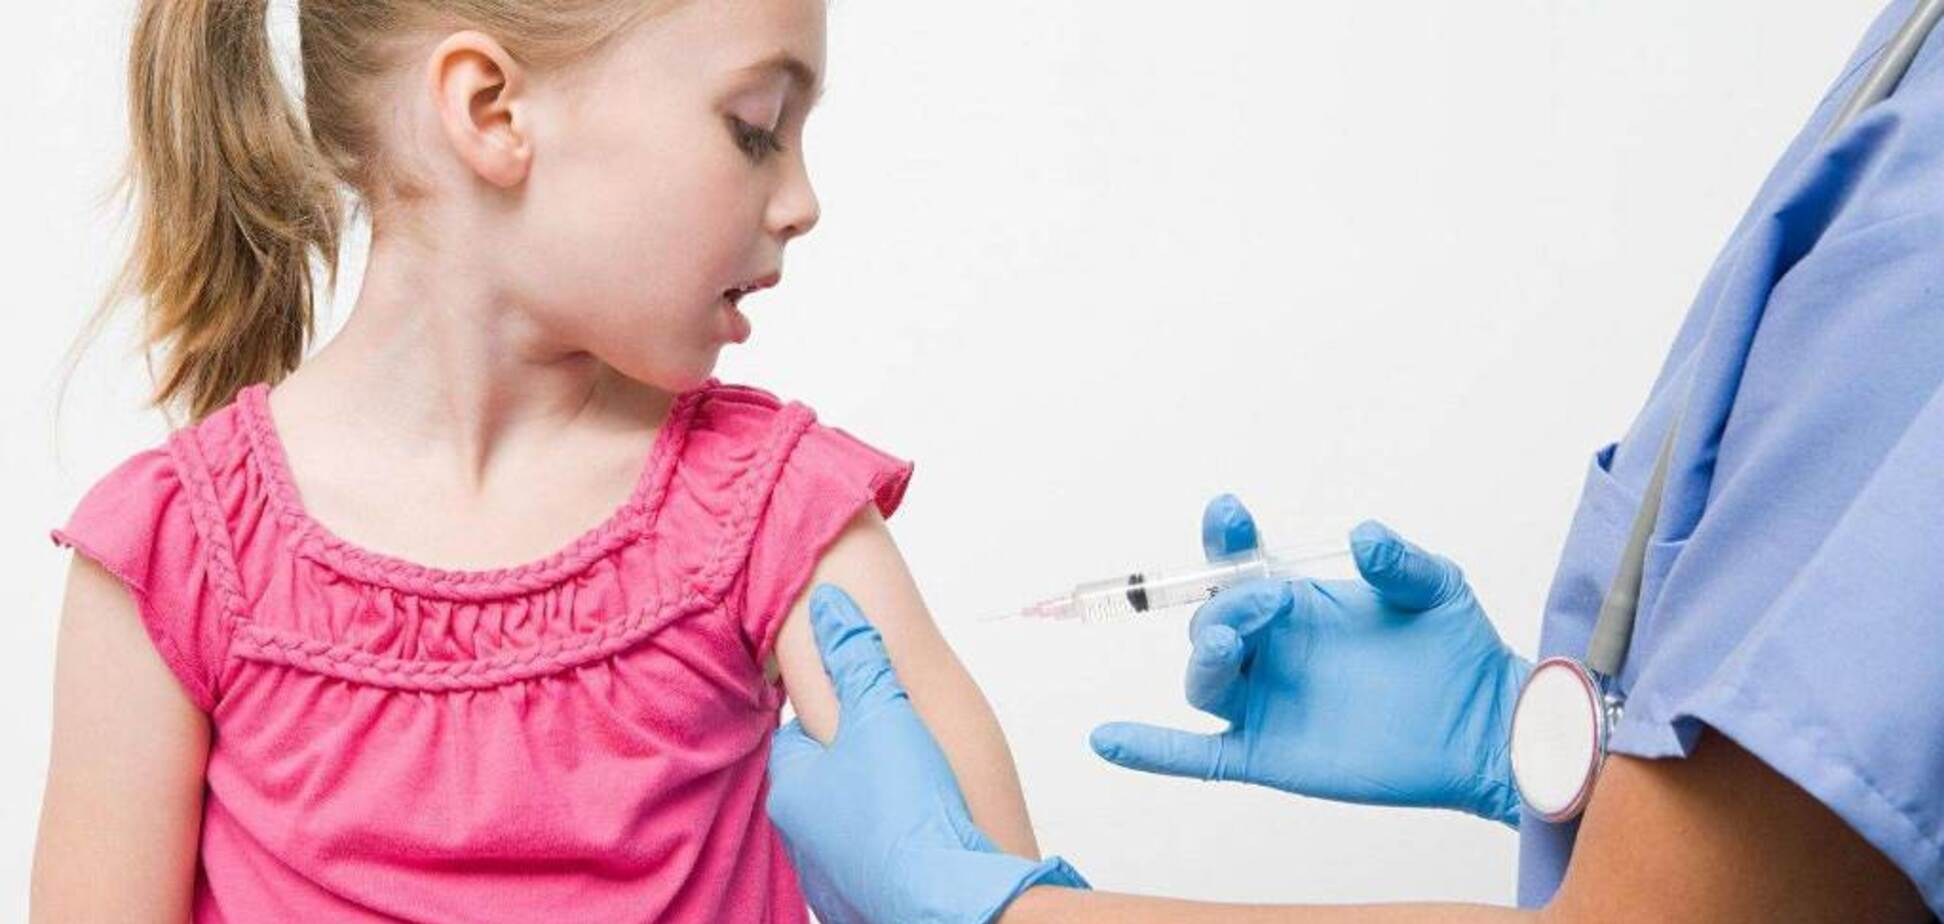 Супрун рассказала, без каких прививок не пустят ребенка в школу